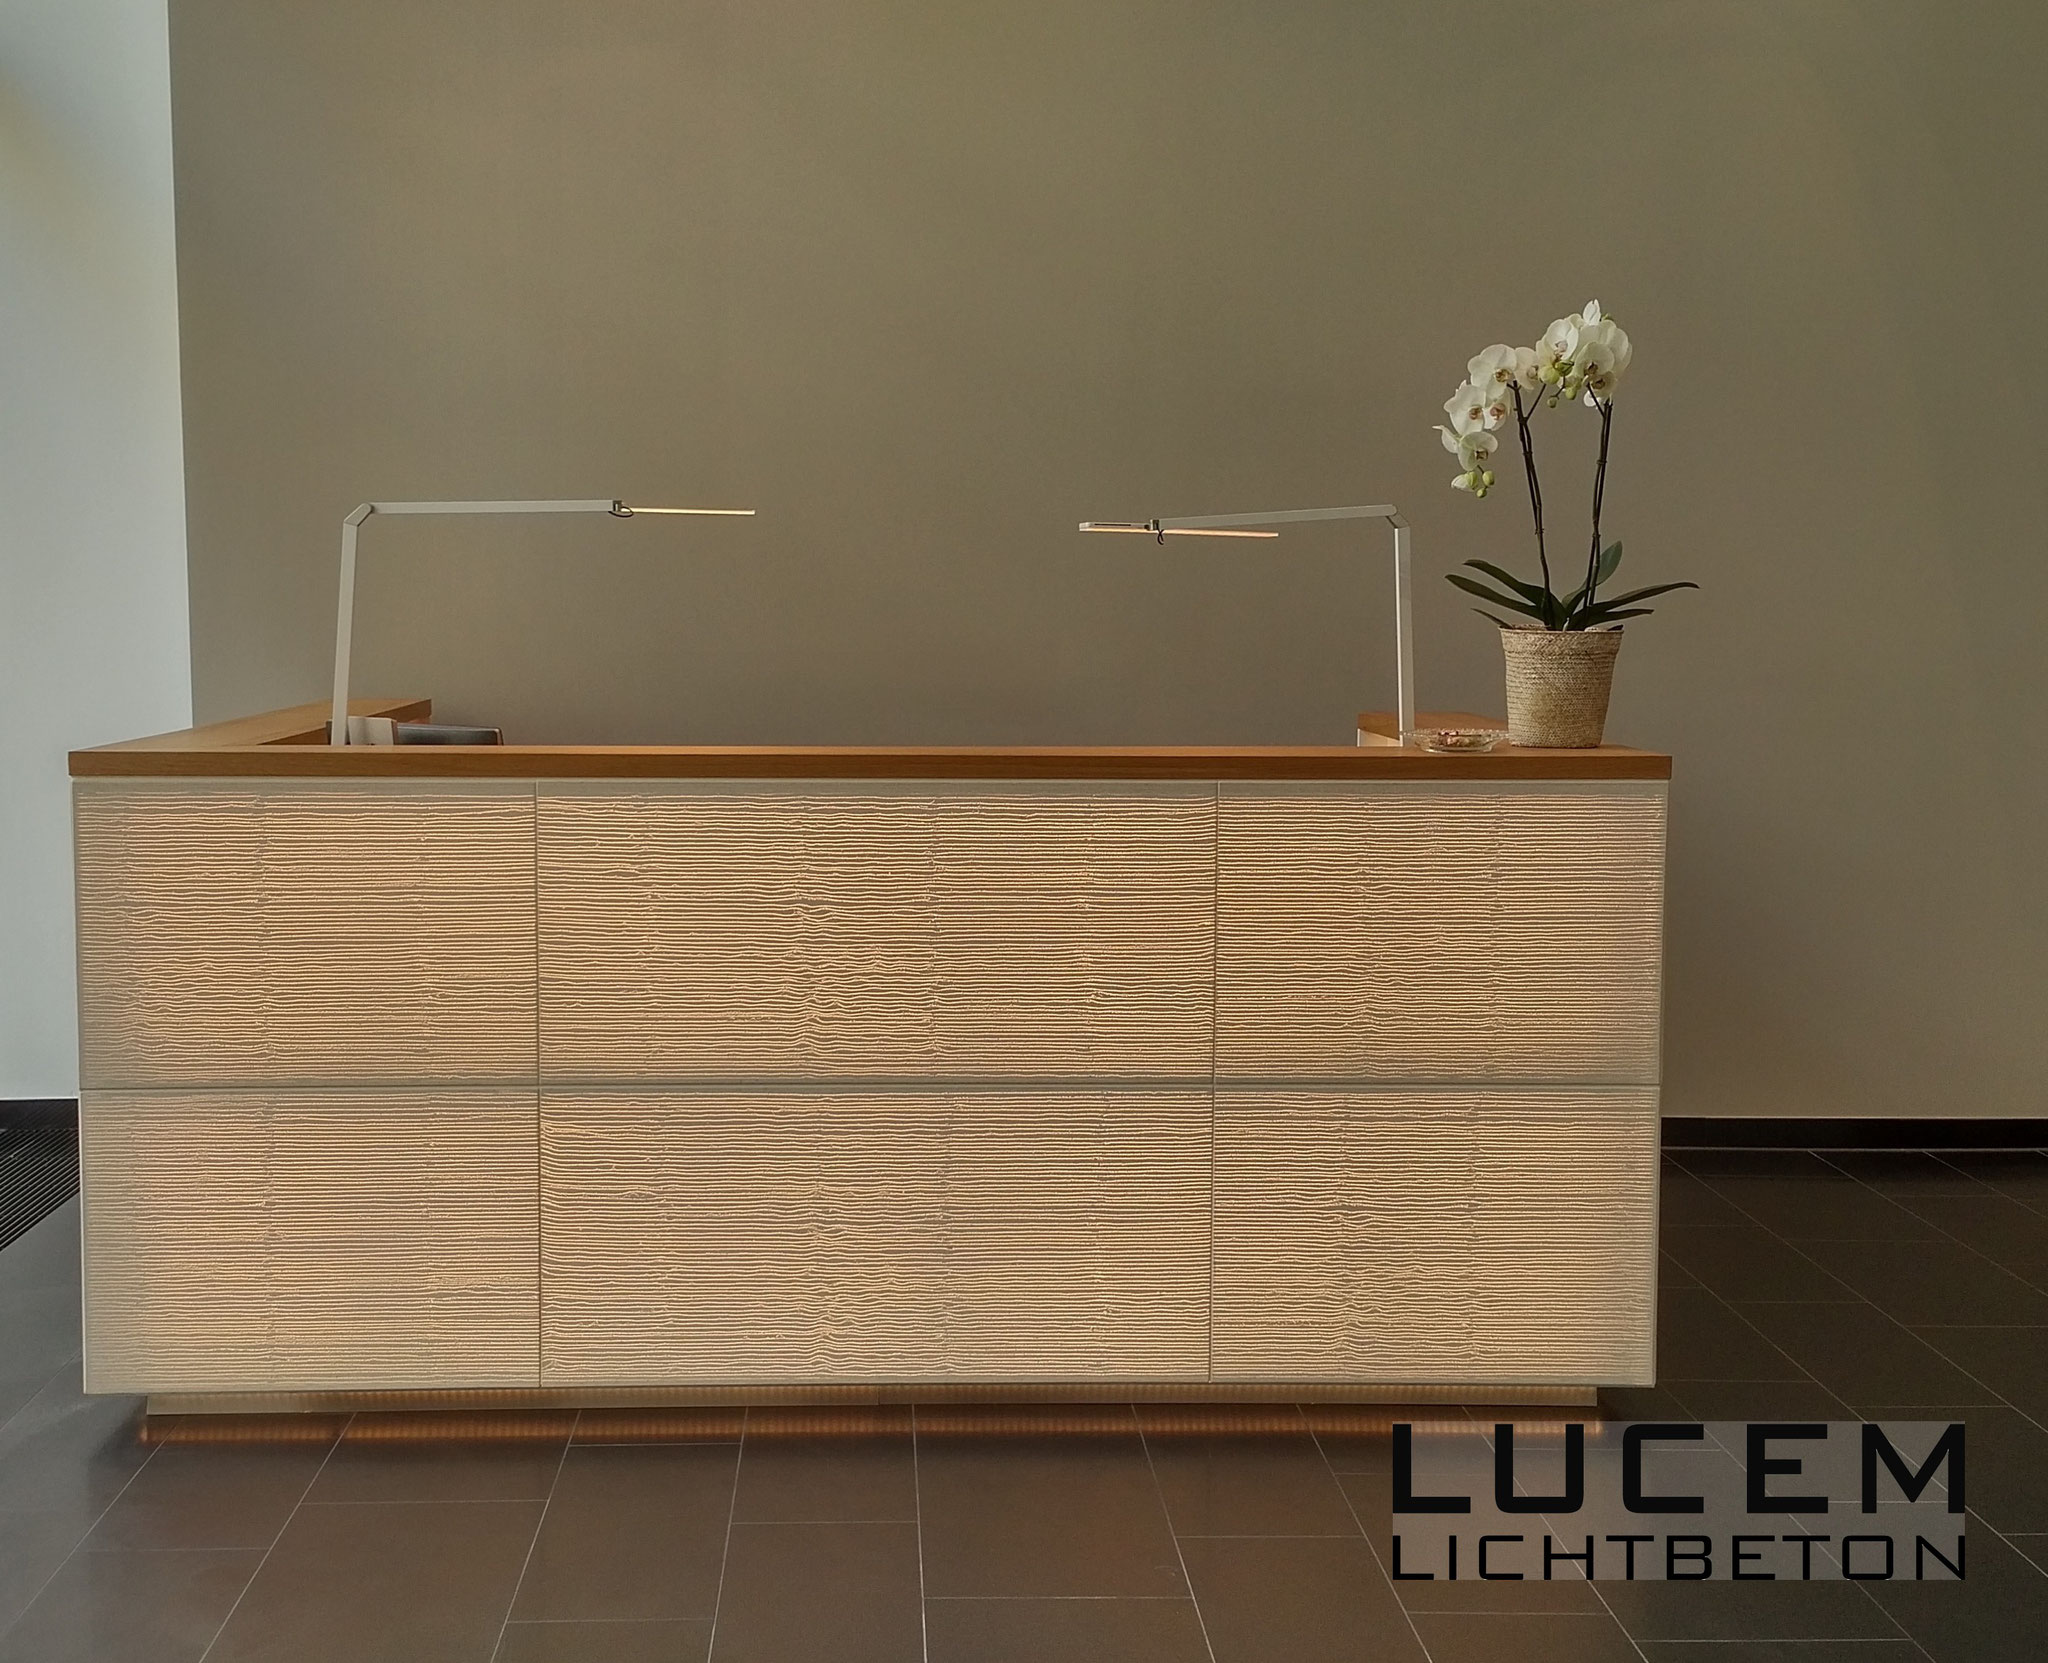 LUCEM Desks/Furniture - LUCEM Lichtbeton